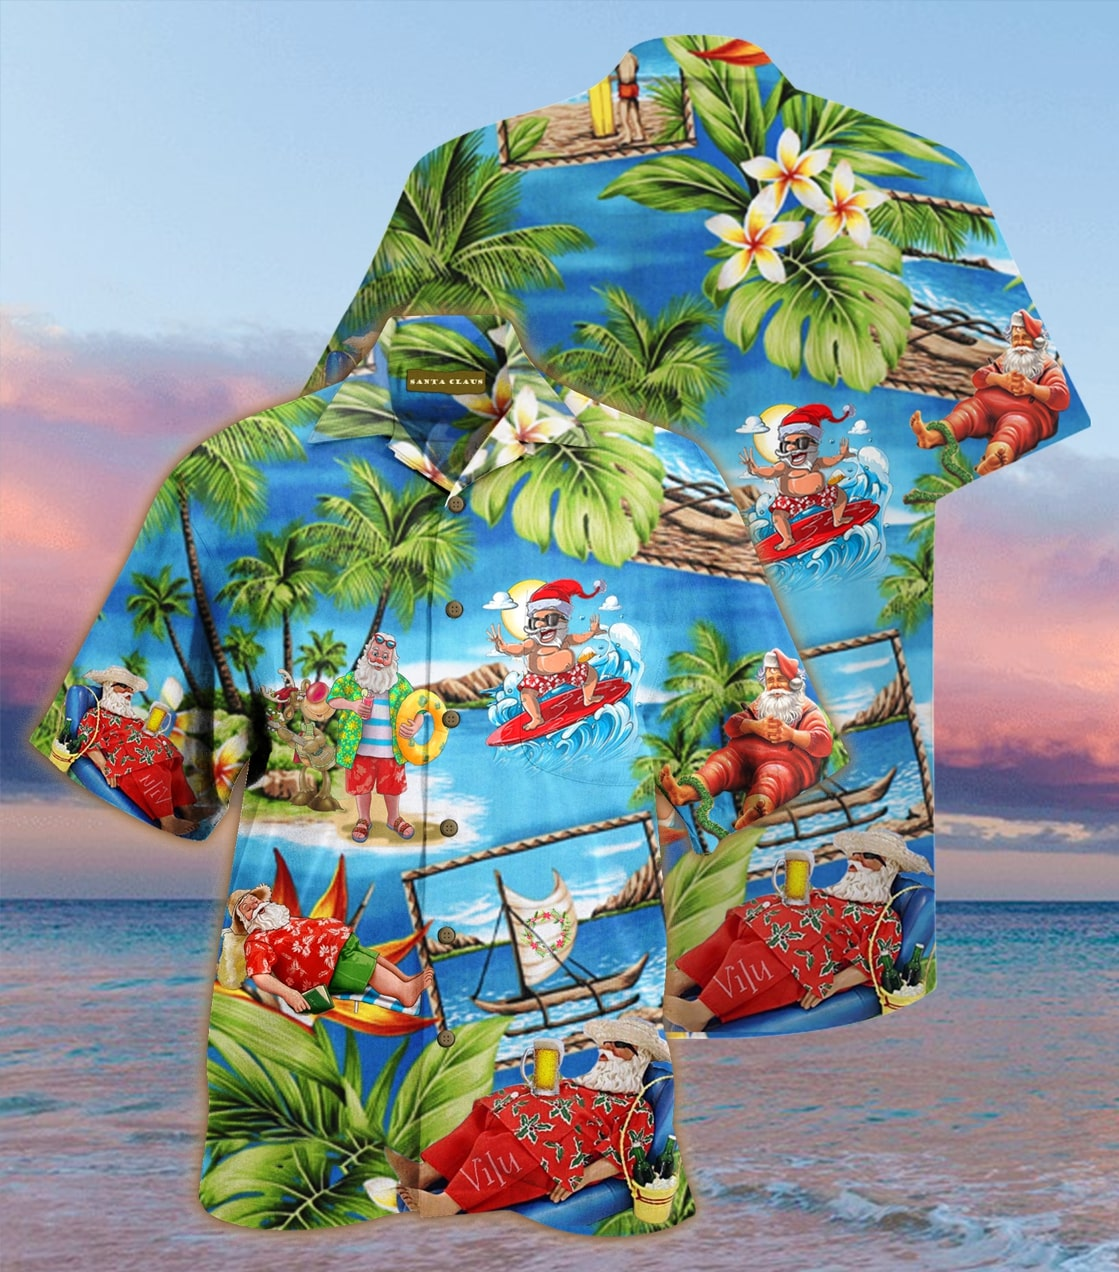 [special edition] christmas santa claus surfing hawaiian shirt - Maria